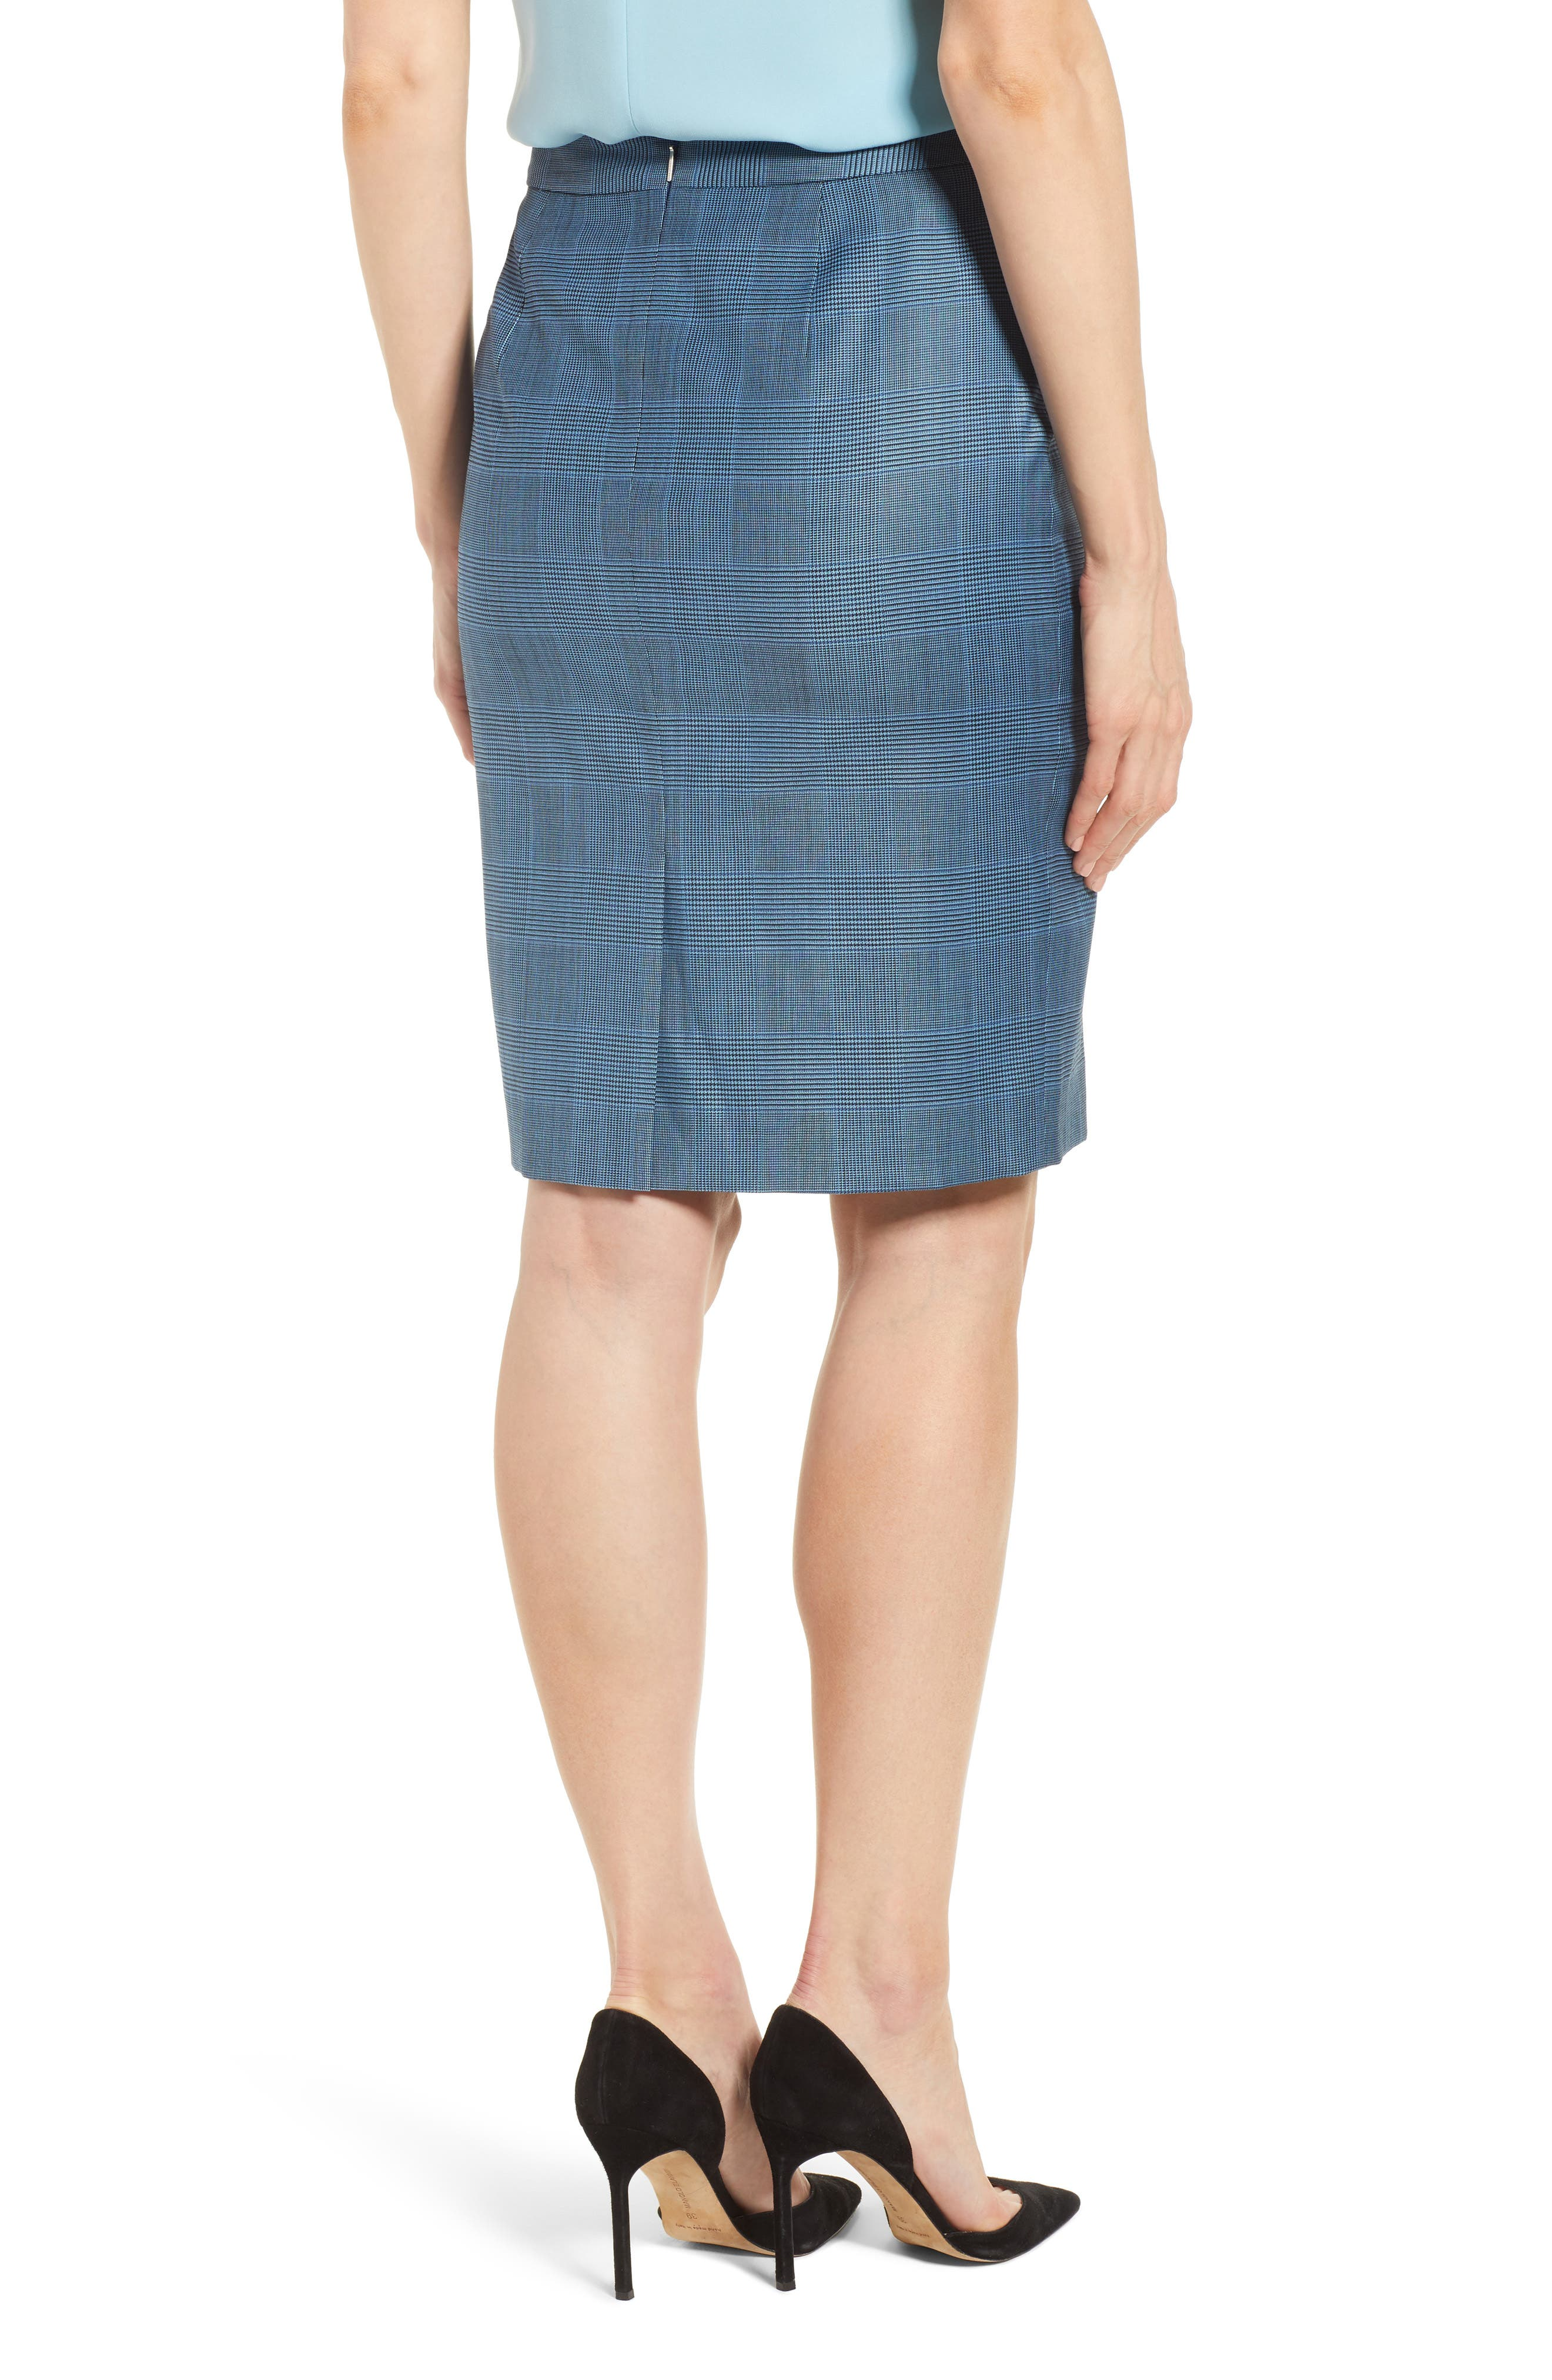 Vimena Glencheck Stretch Wool Pencil Skirt,                             Alternate thumbnail 2, color,                             Sailor Blue Fantasy